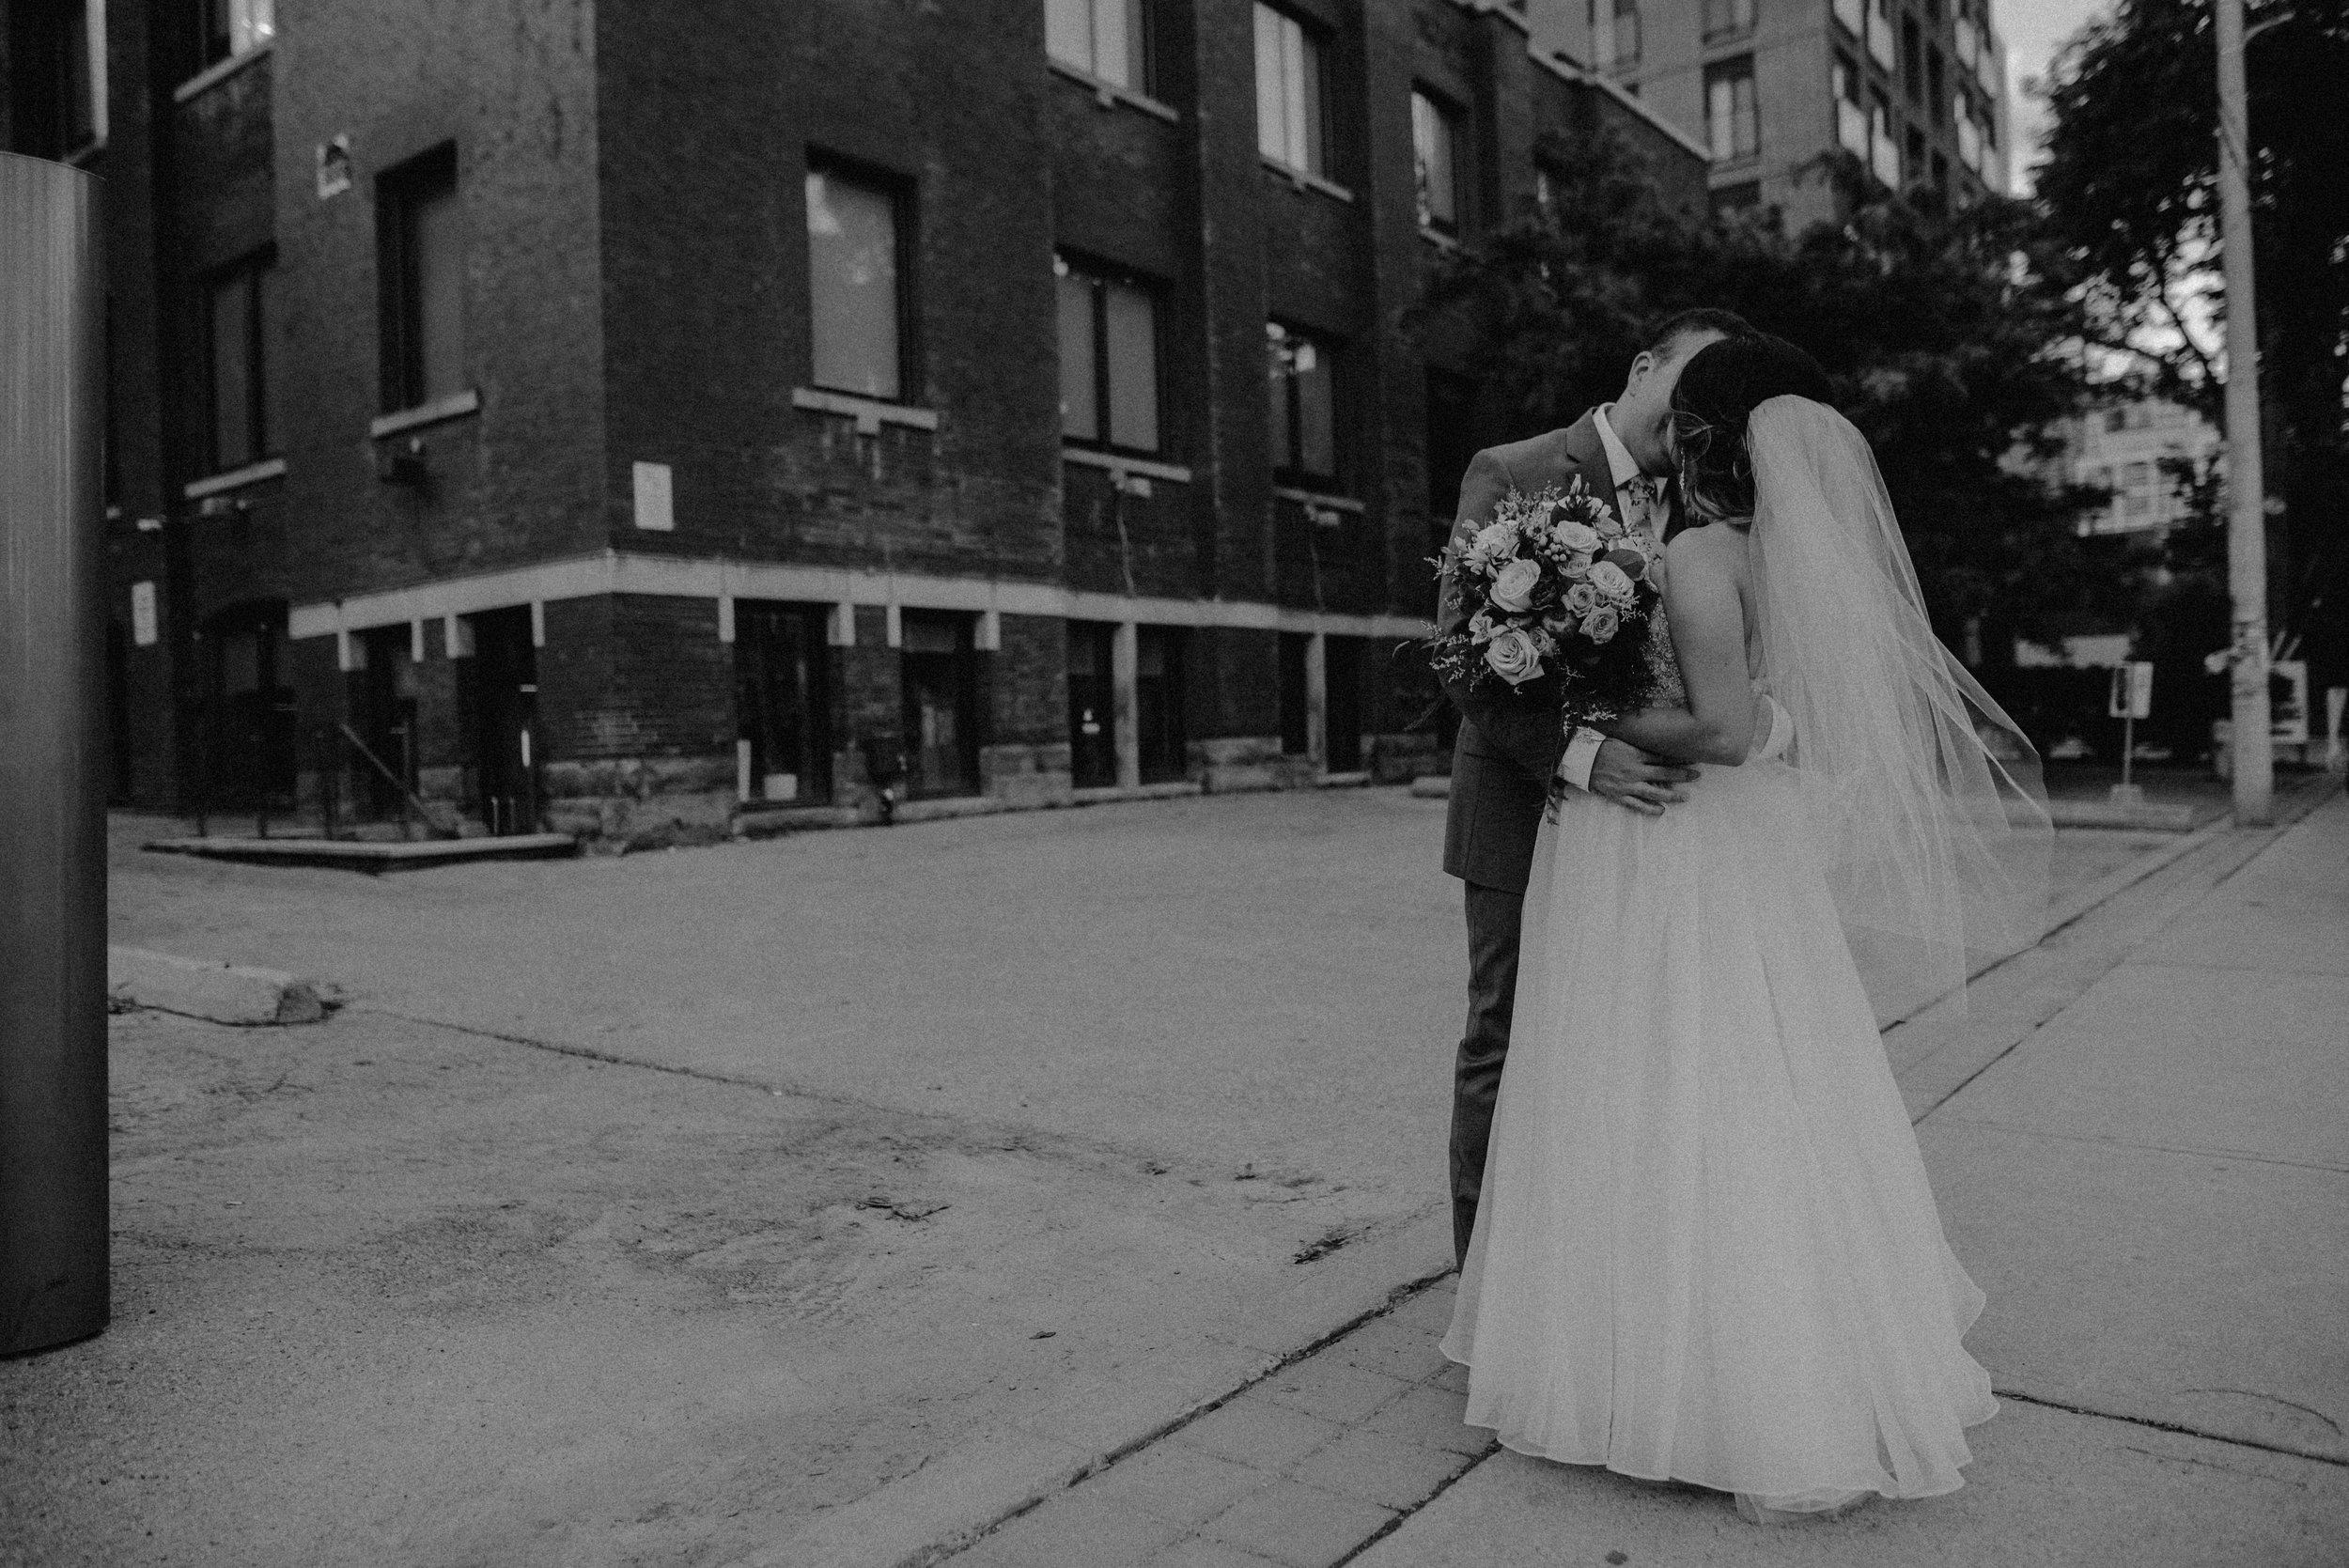 mariage_photographe_toronto_gatineau_ottawa_photographer_wedding-91.jpg